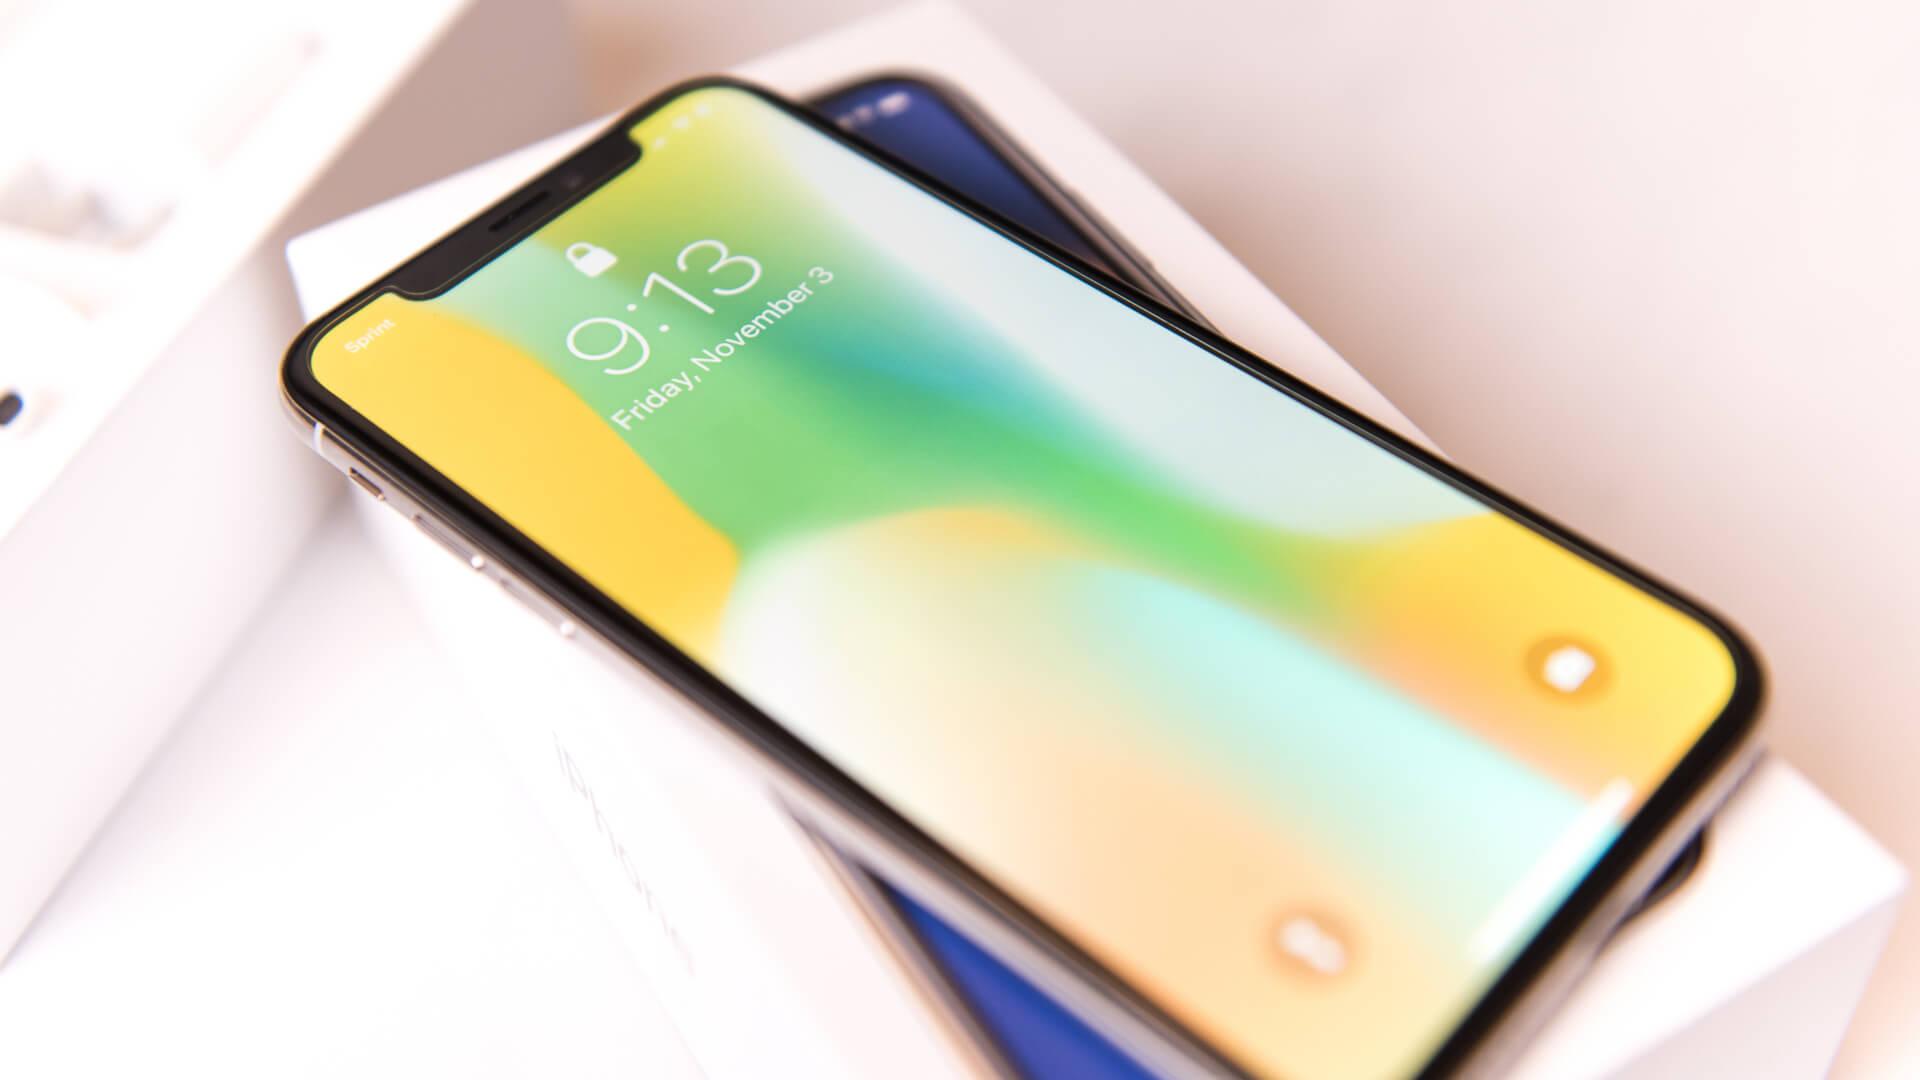 Apple-iPhone-X-smartphone